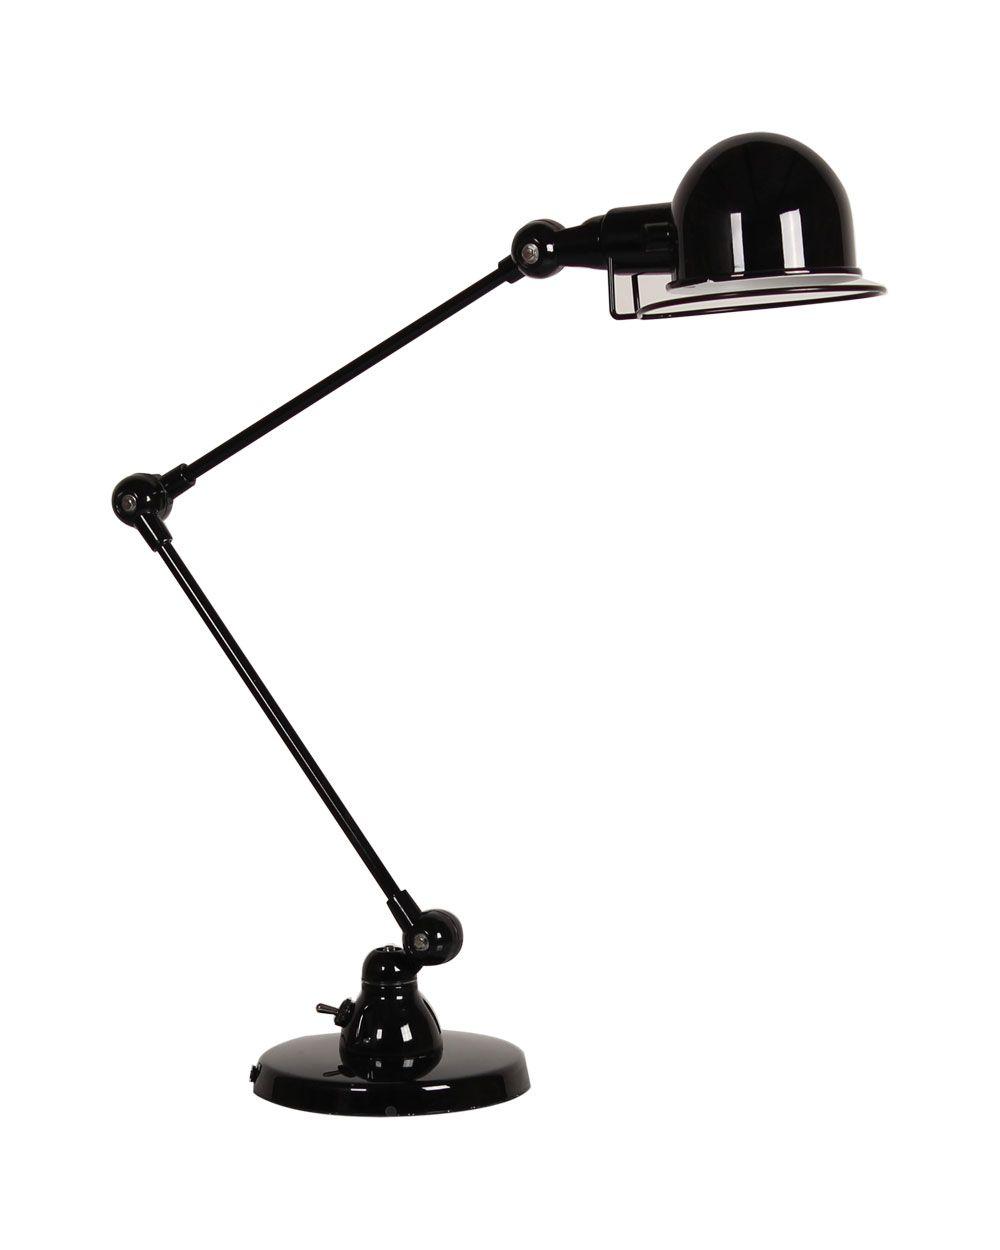 Lampe De Bureau Jld Loft Decoration Interieure Style Industriel